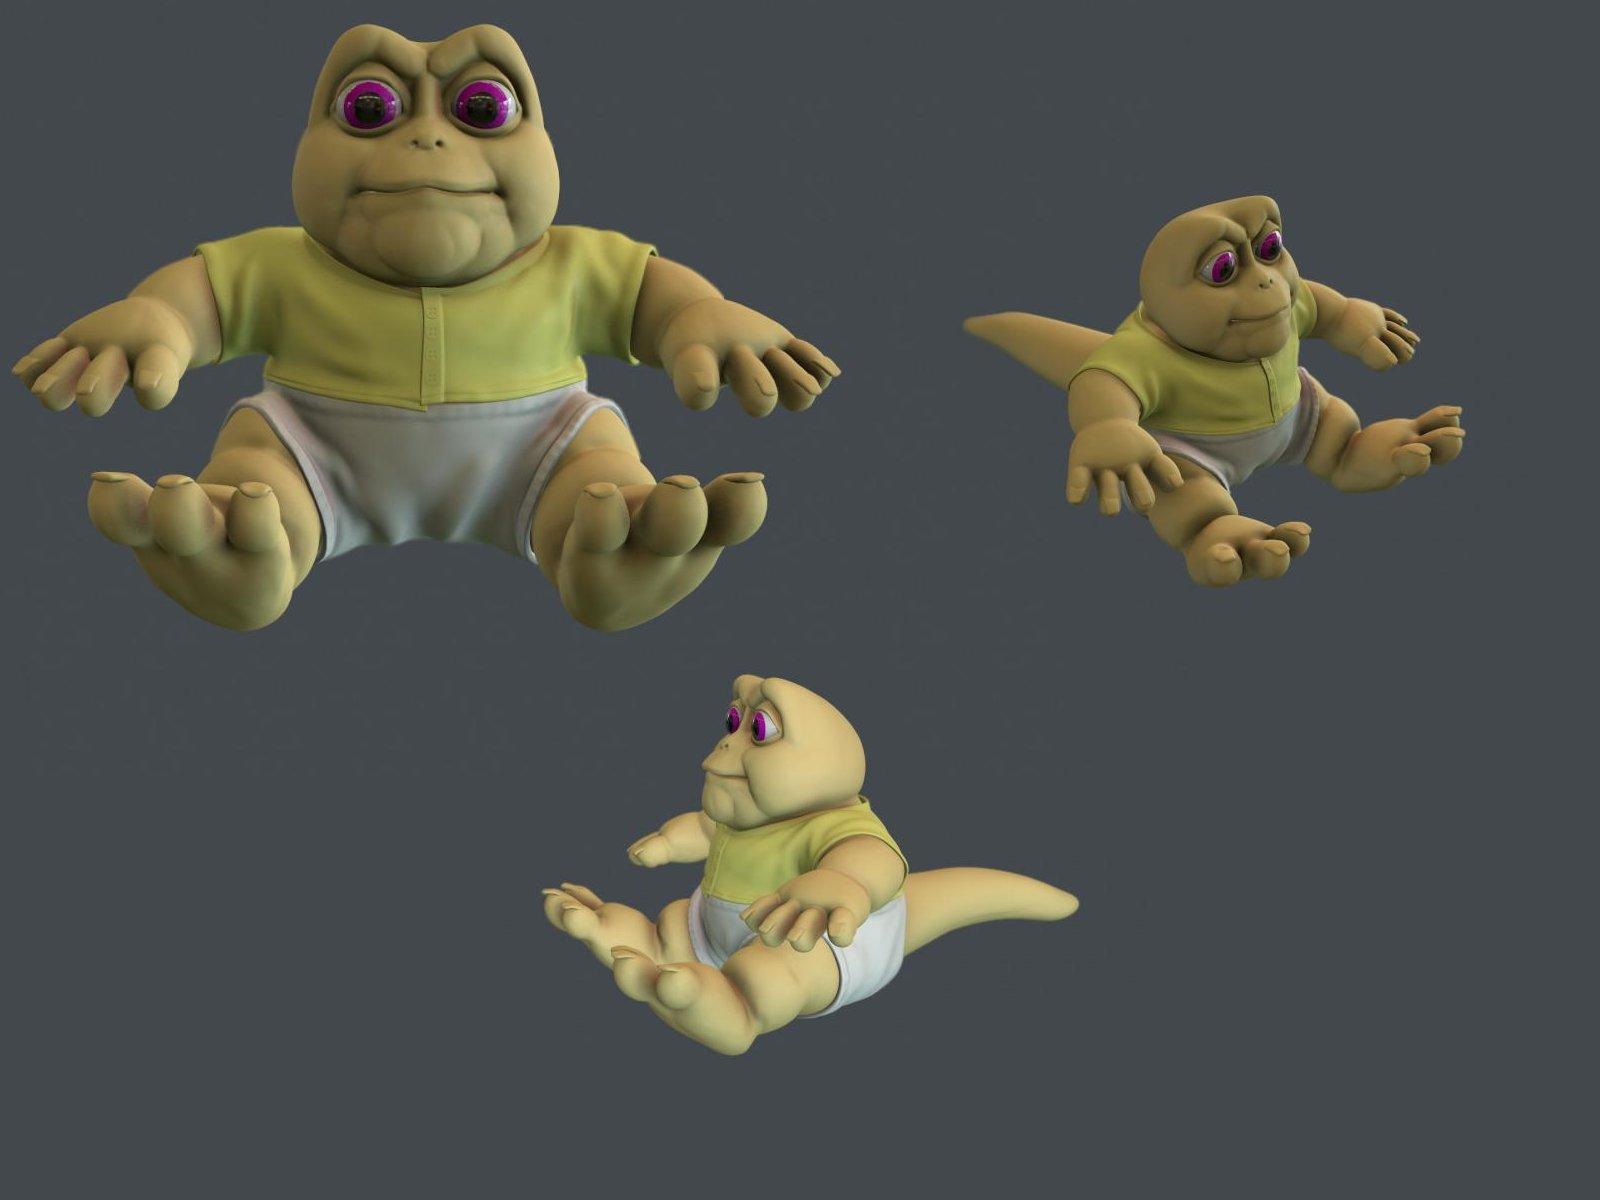 Disney Tv Show Dinosaur Sinclair Family Baby Figure 3 1 2 Tall Hollow Pvc